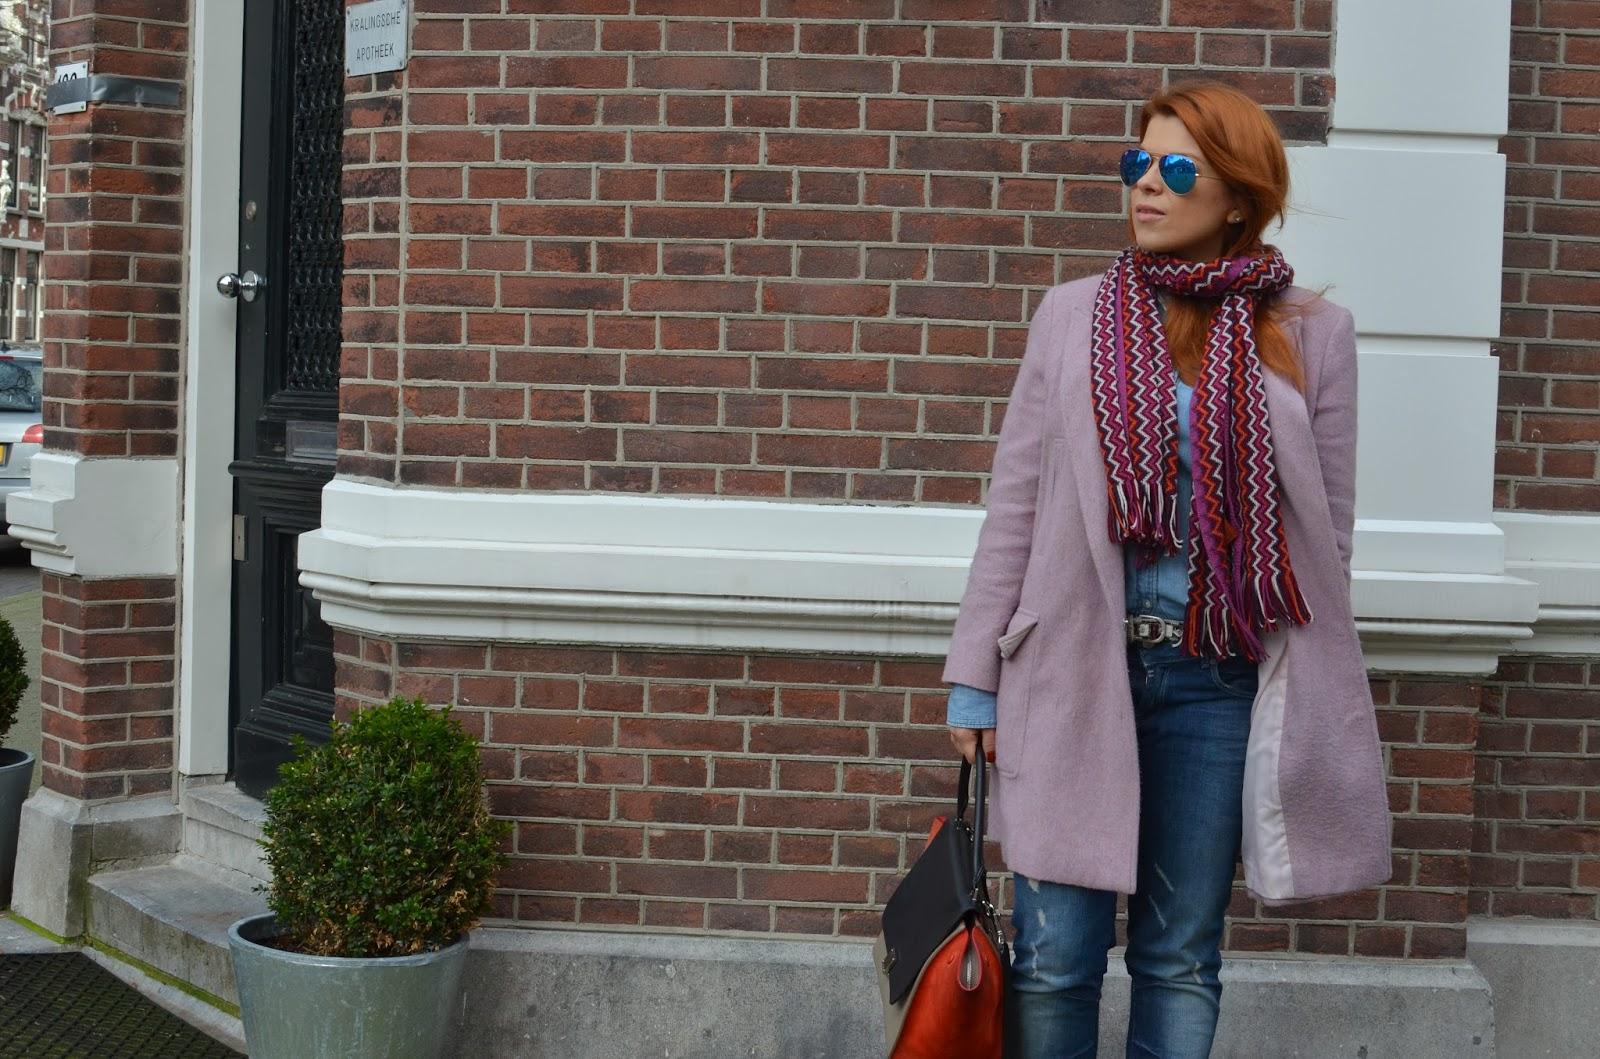 fashion bridge, fashion-bridge.blogspot.com, fashion bridge blog, street style, street style netherlands, street fashion, street fashion netherlands, celine trapeze bag, missoni scarves, jak joten, tres jewellery, brooches, pink coats, street style pink coats